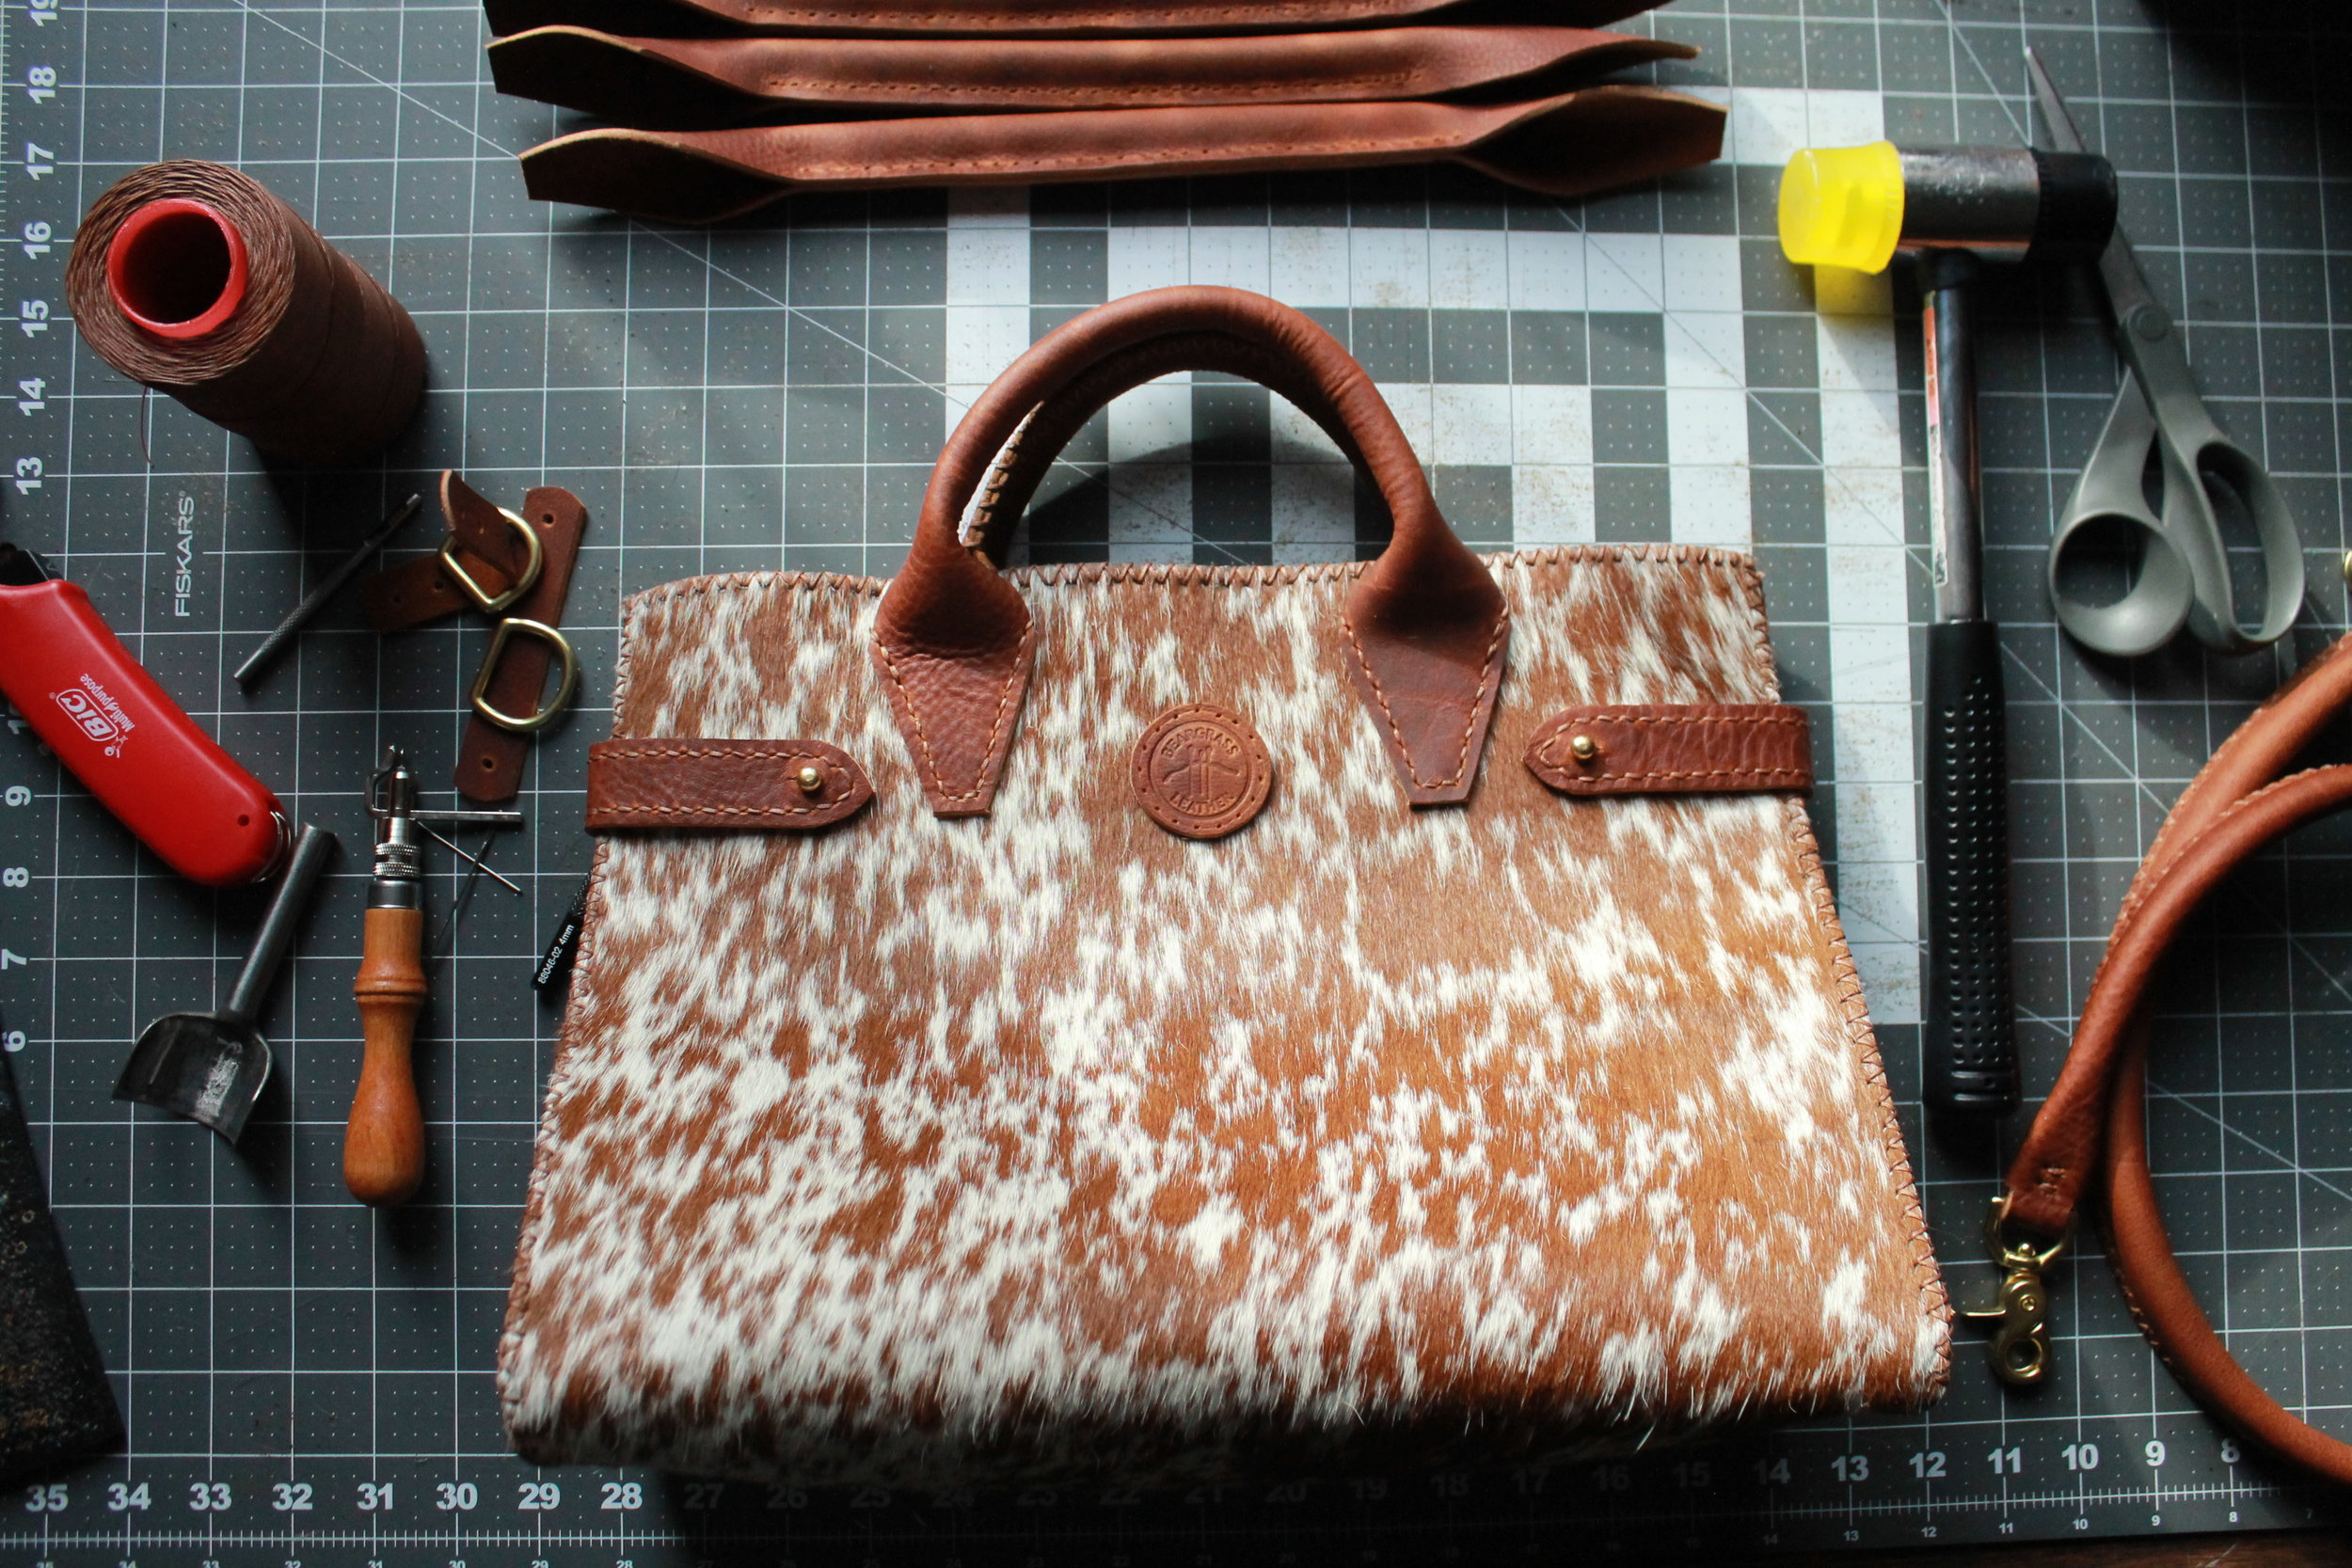 American Made Handbag Bespoke Hair-on-hide